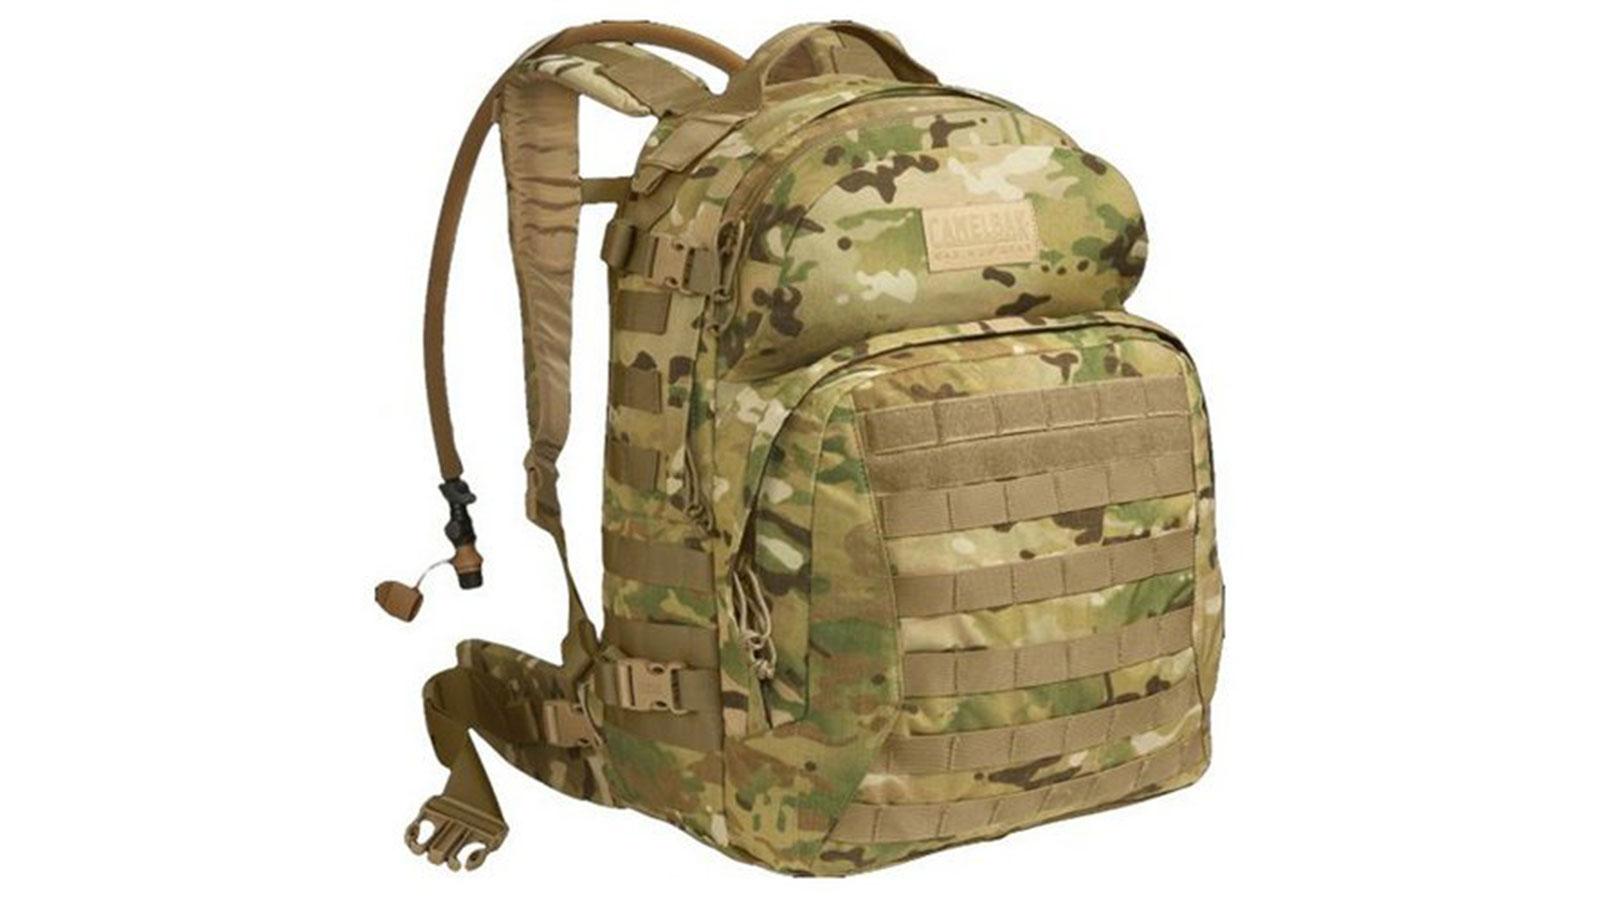 Camelbak Motherlode Hydration Cargo Tactical Backpack | best tactical backpacks